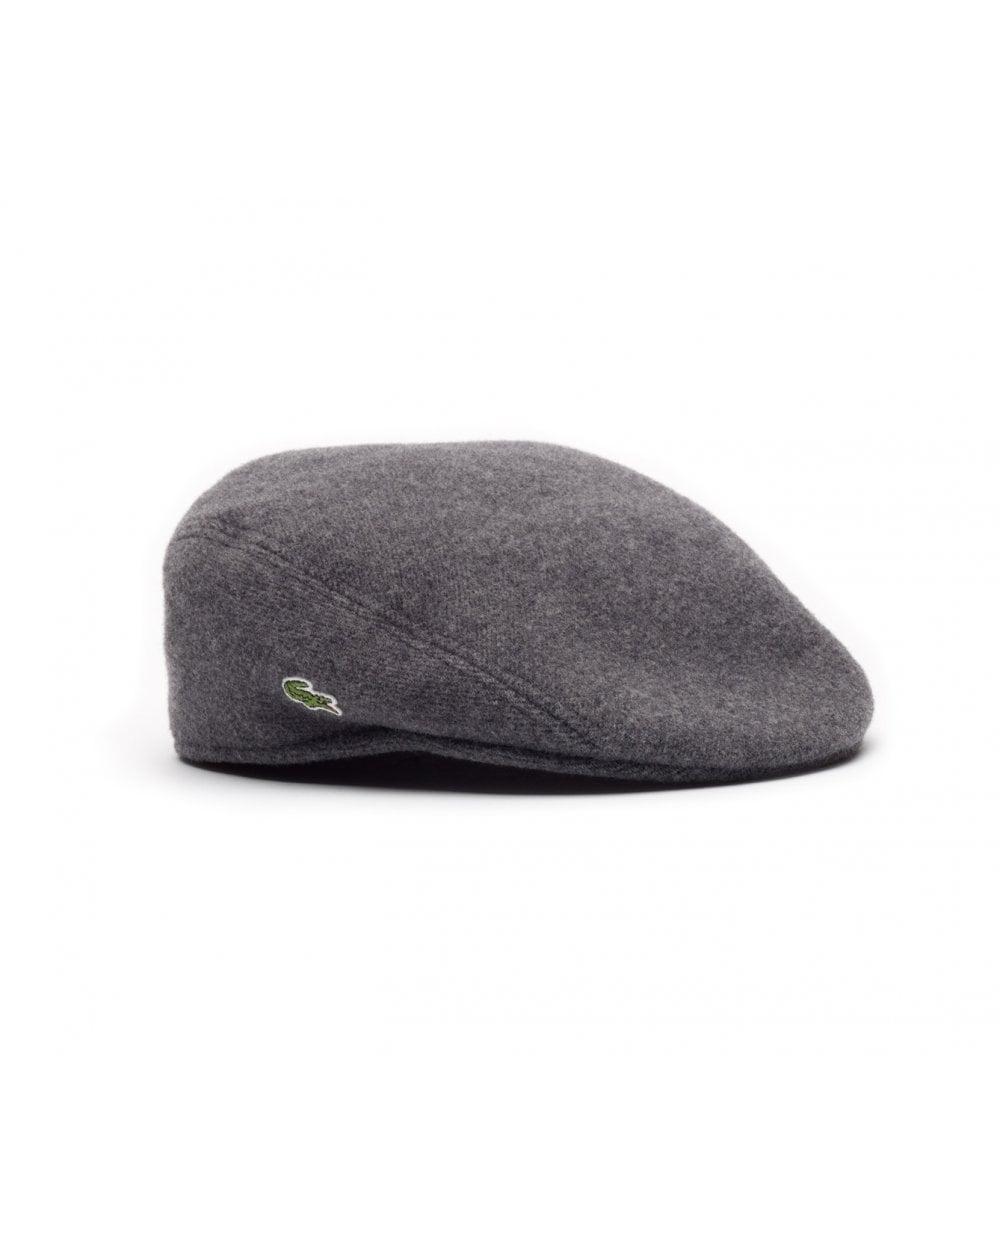 7974231c Lacoste Wool Broadcloth Flat Cap Stone Grey, Men's, Hat